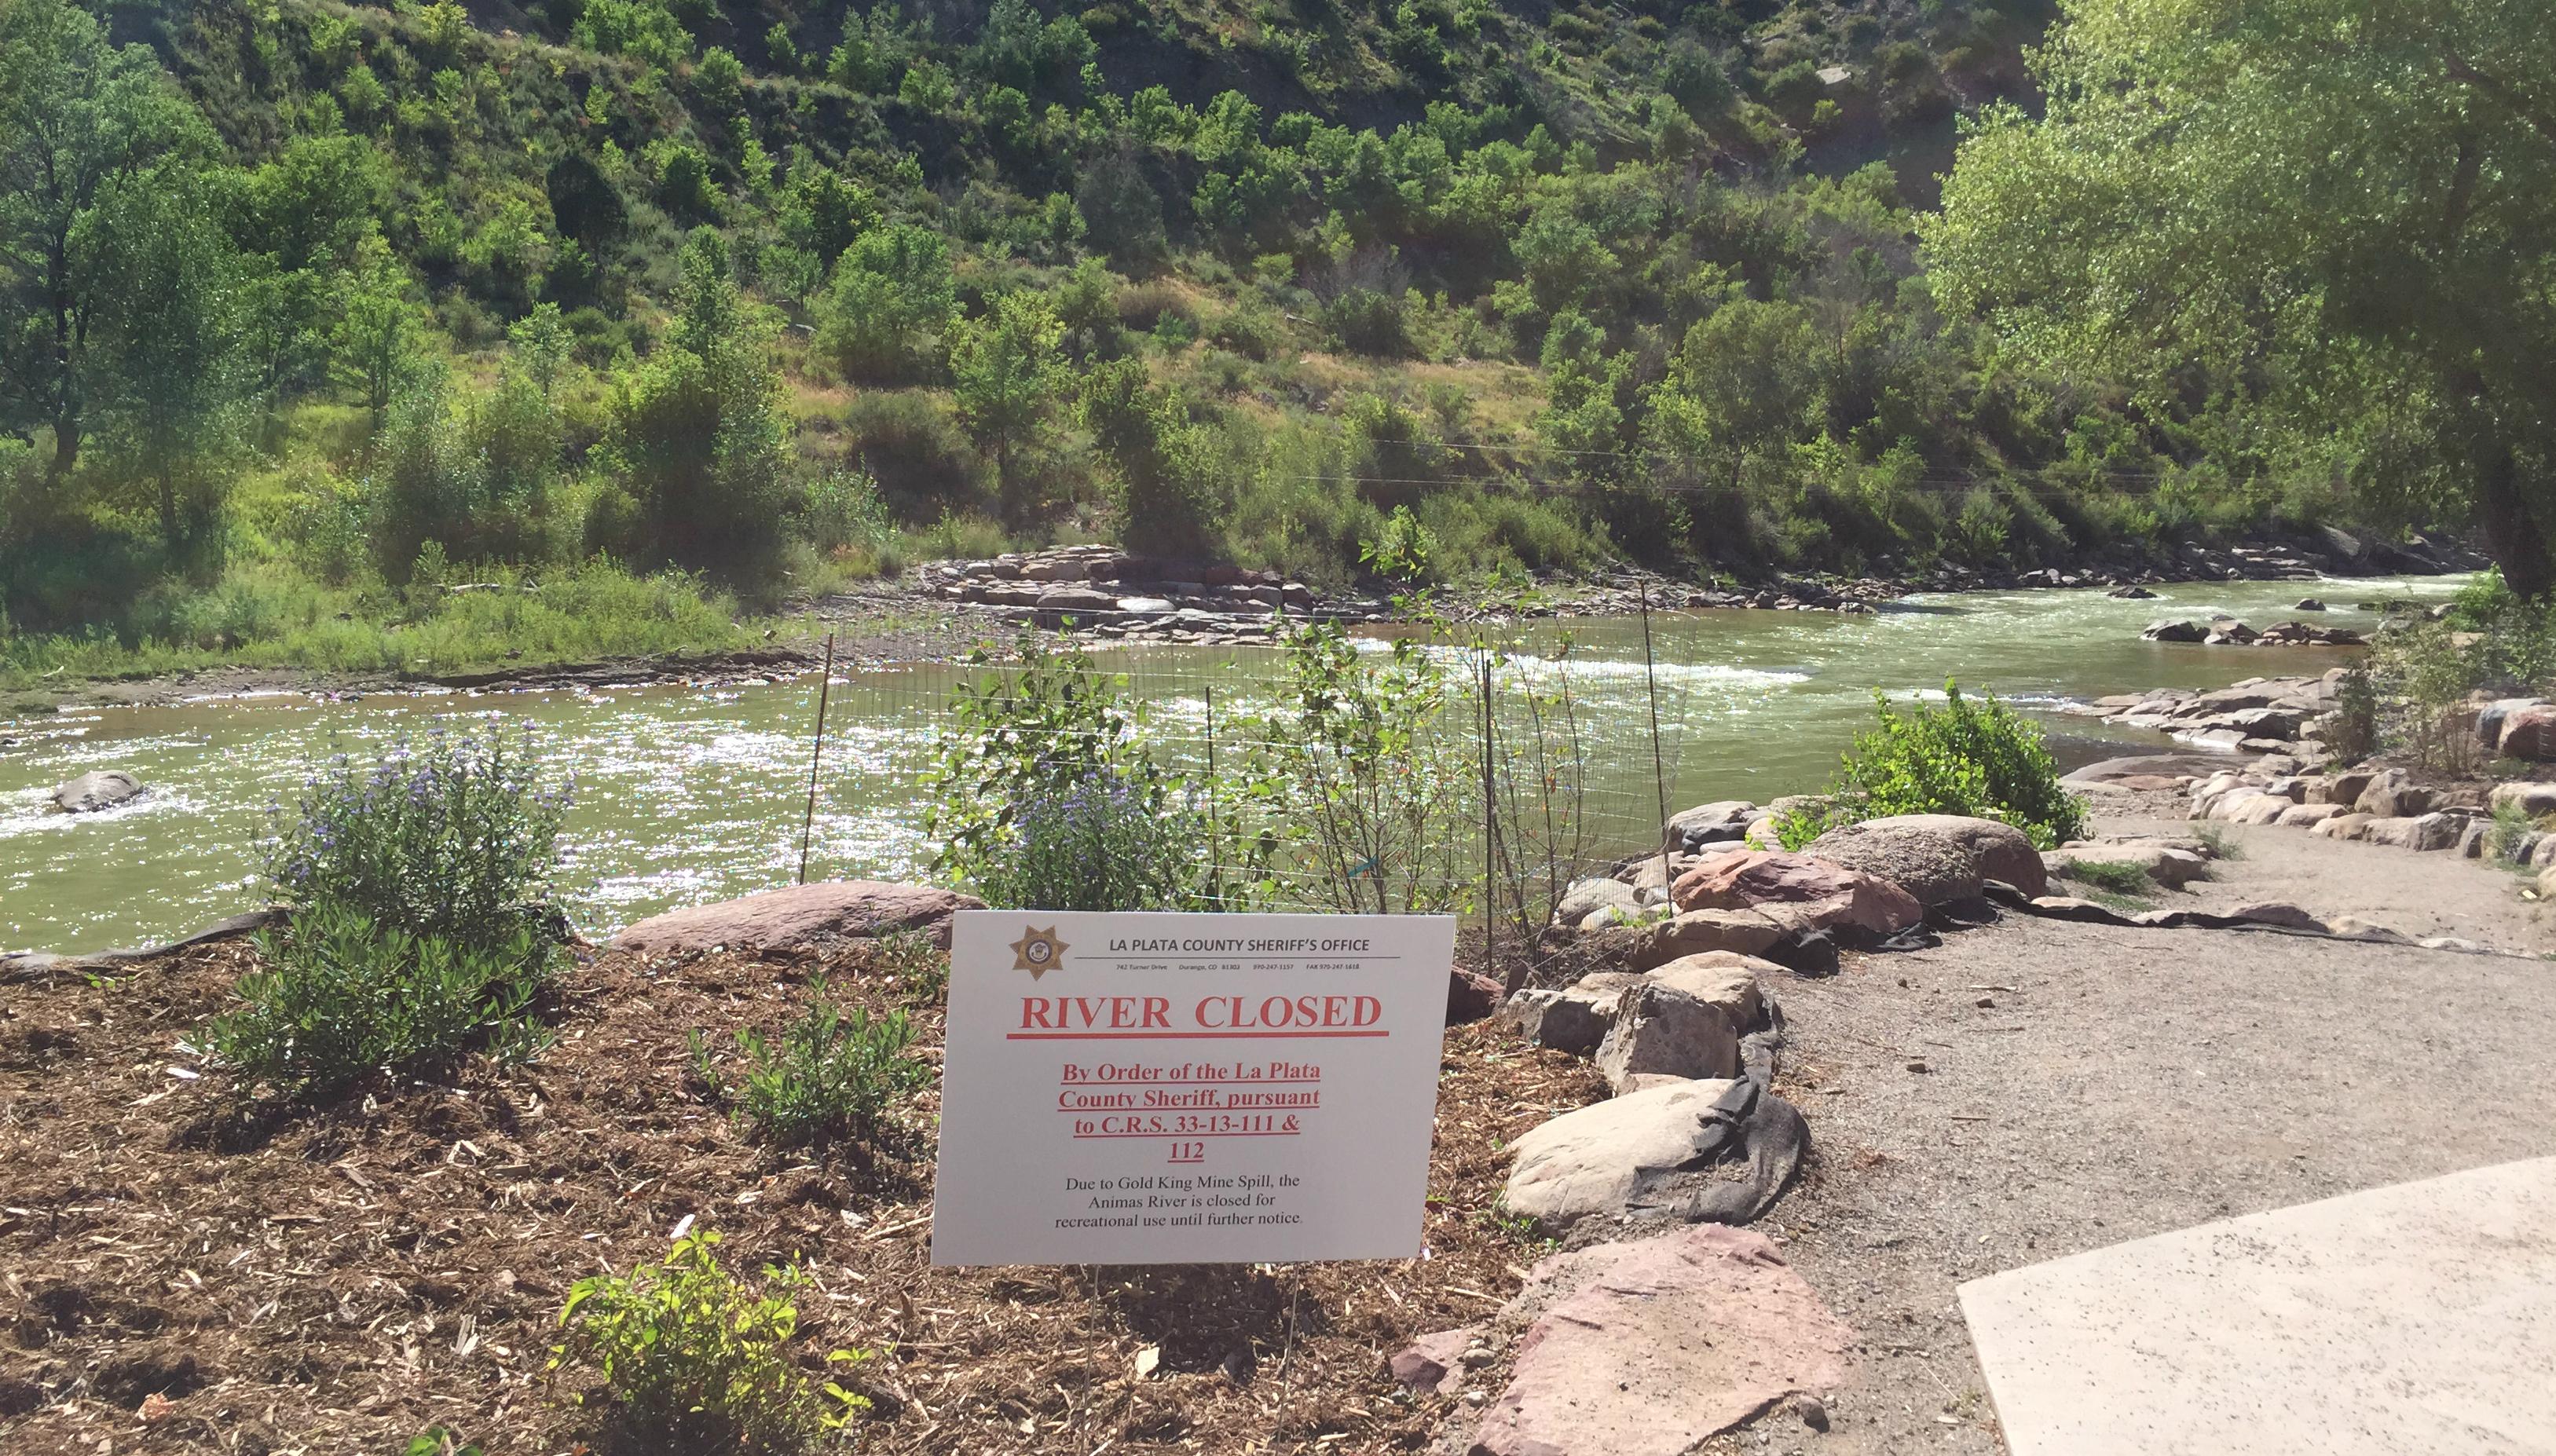 Photo: River Closed